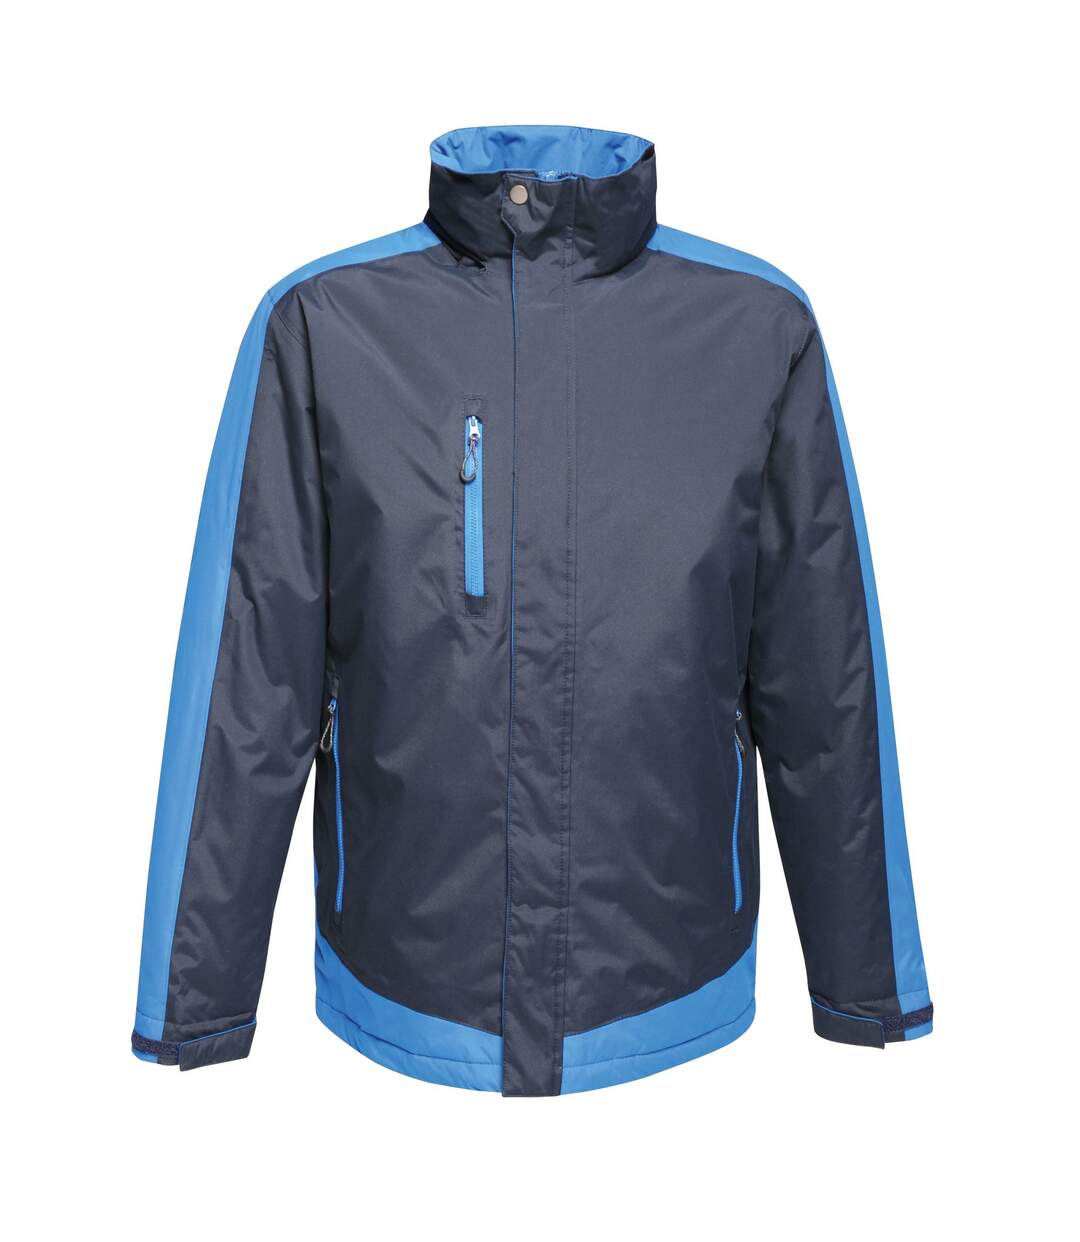 Regatta Mens Contrast Full Zip Jacket (Signal Black/Signal Grey) - UTRG3743